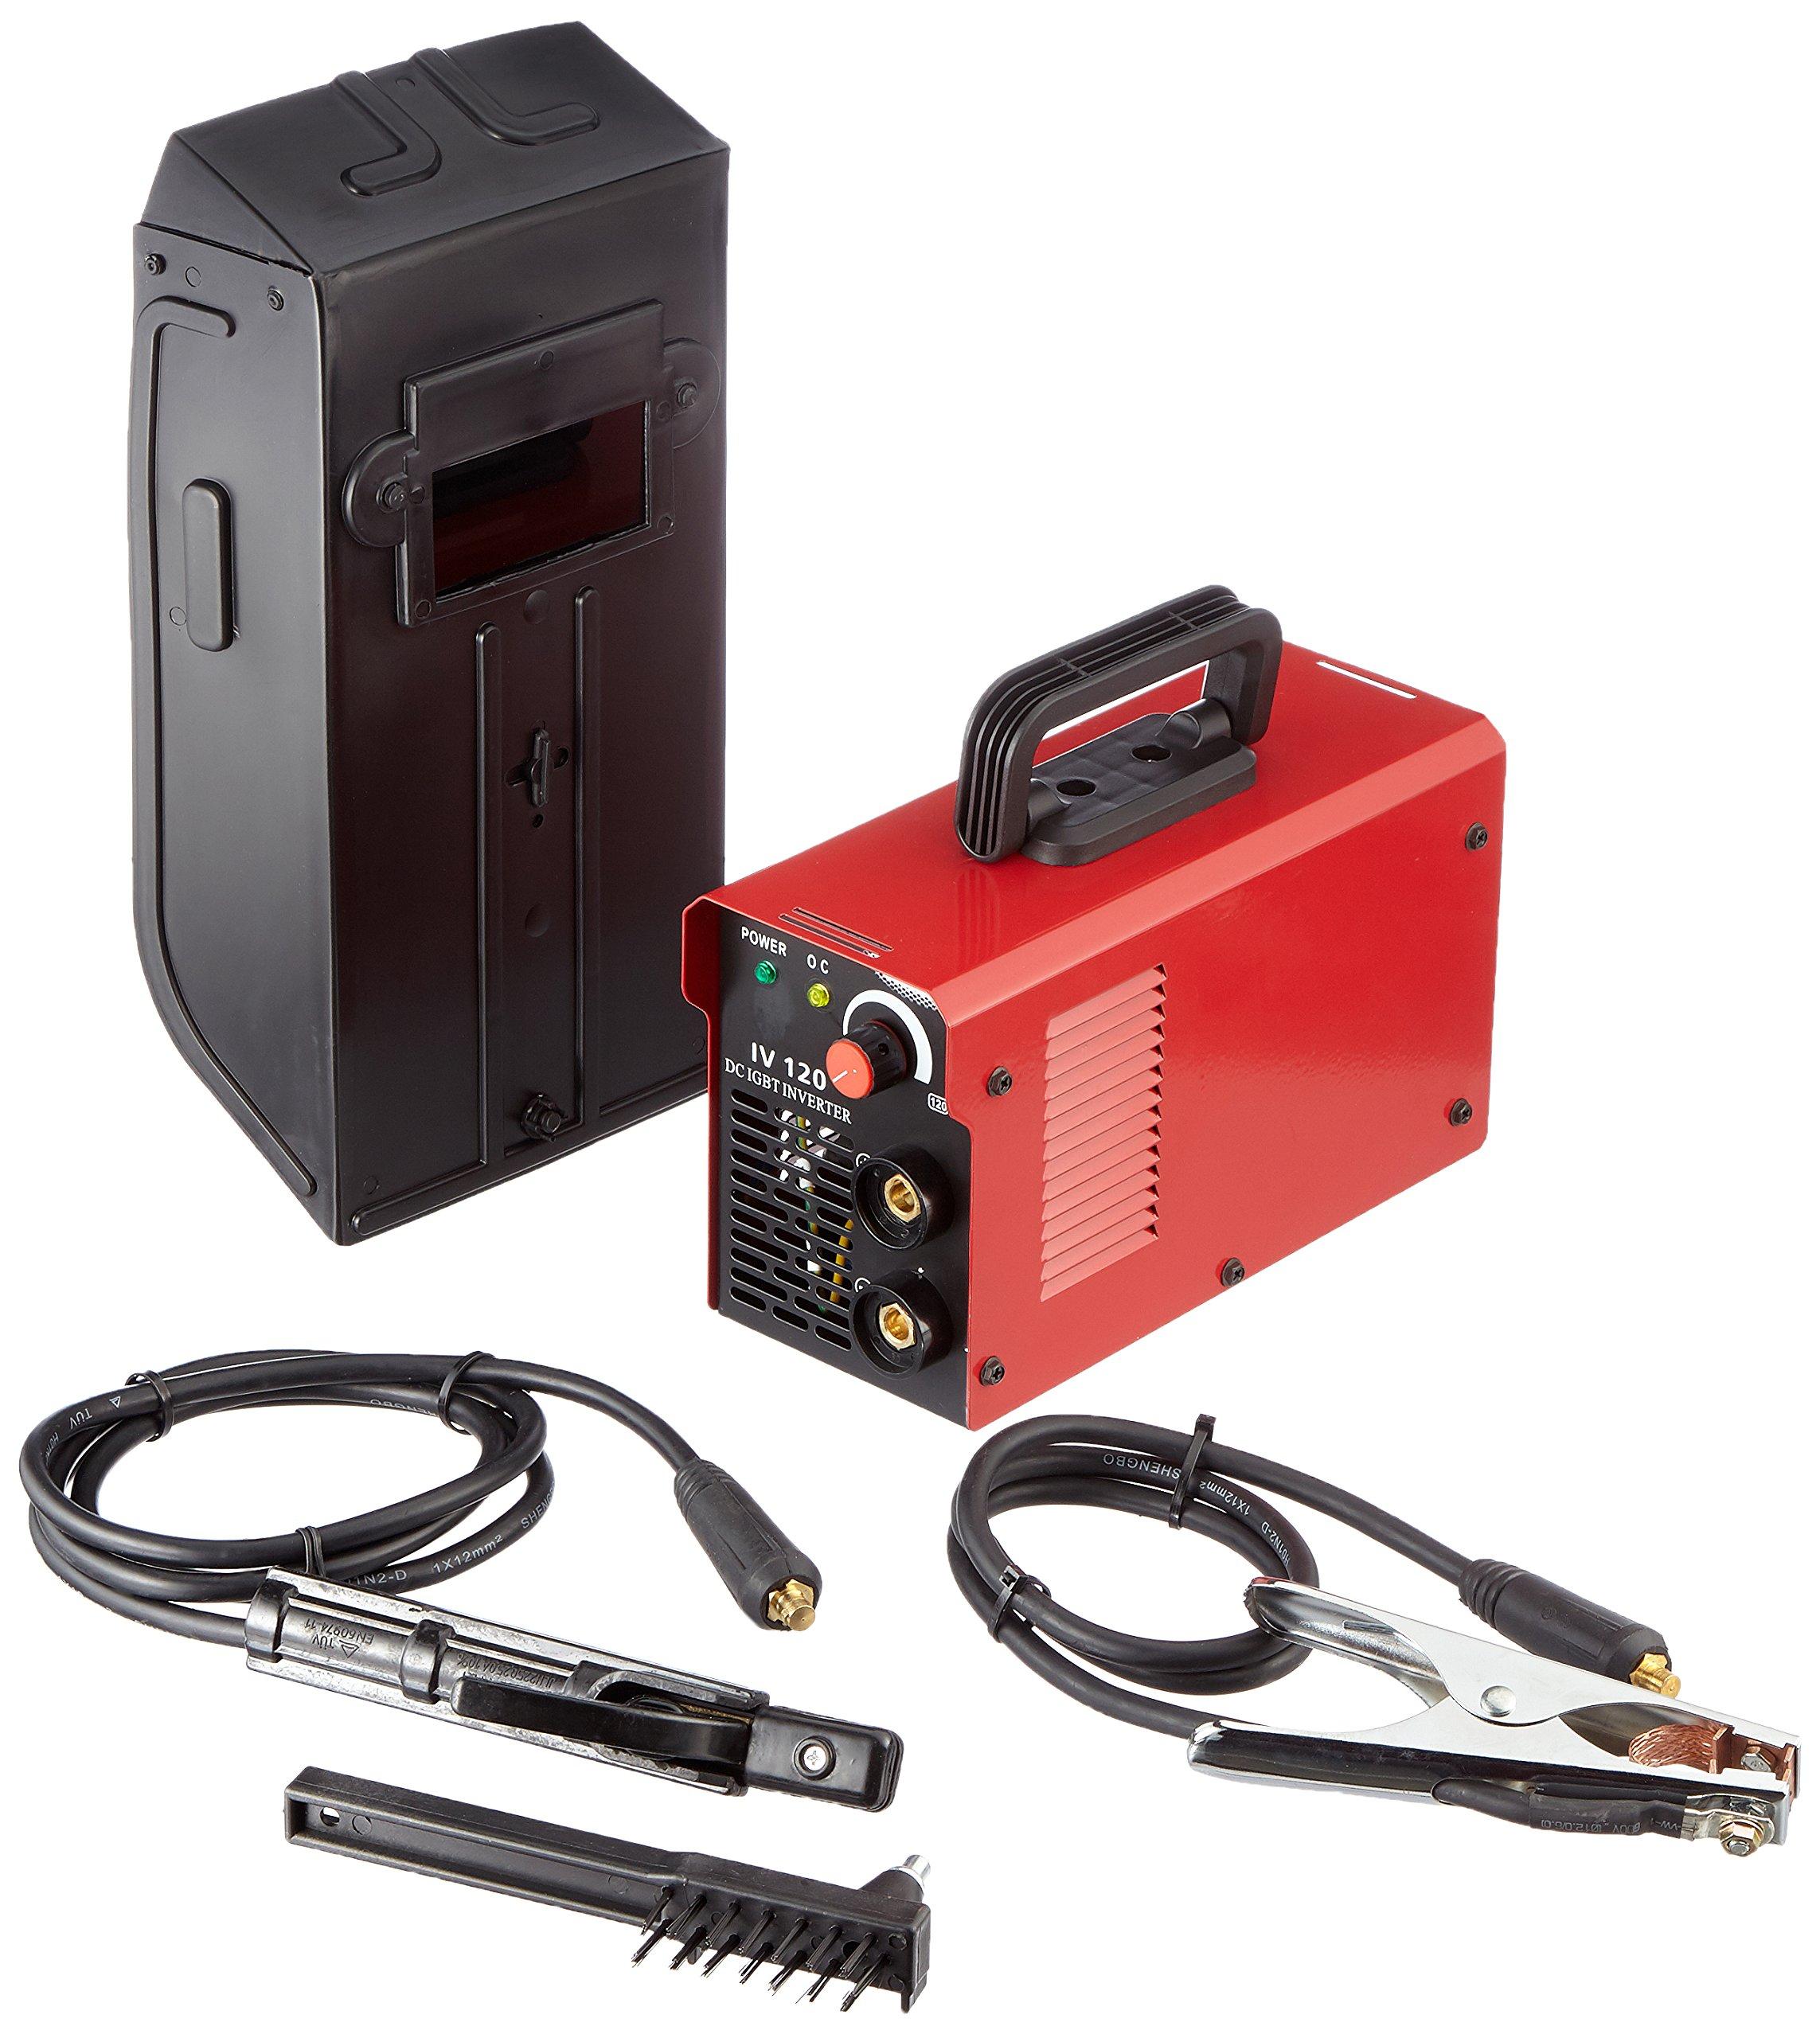 Matrix 170200115Inverter de sudor dispositivo, 3200W, 230V